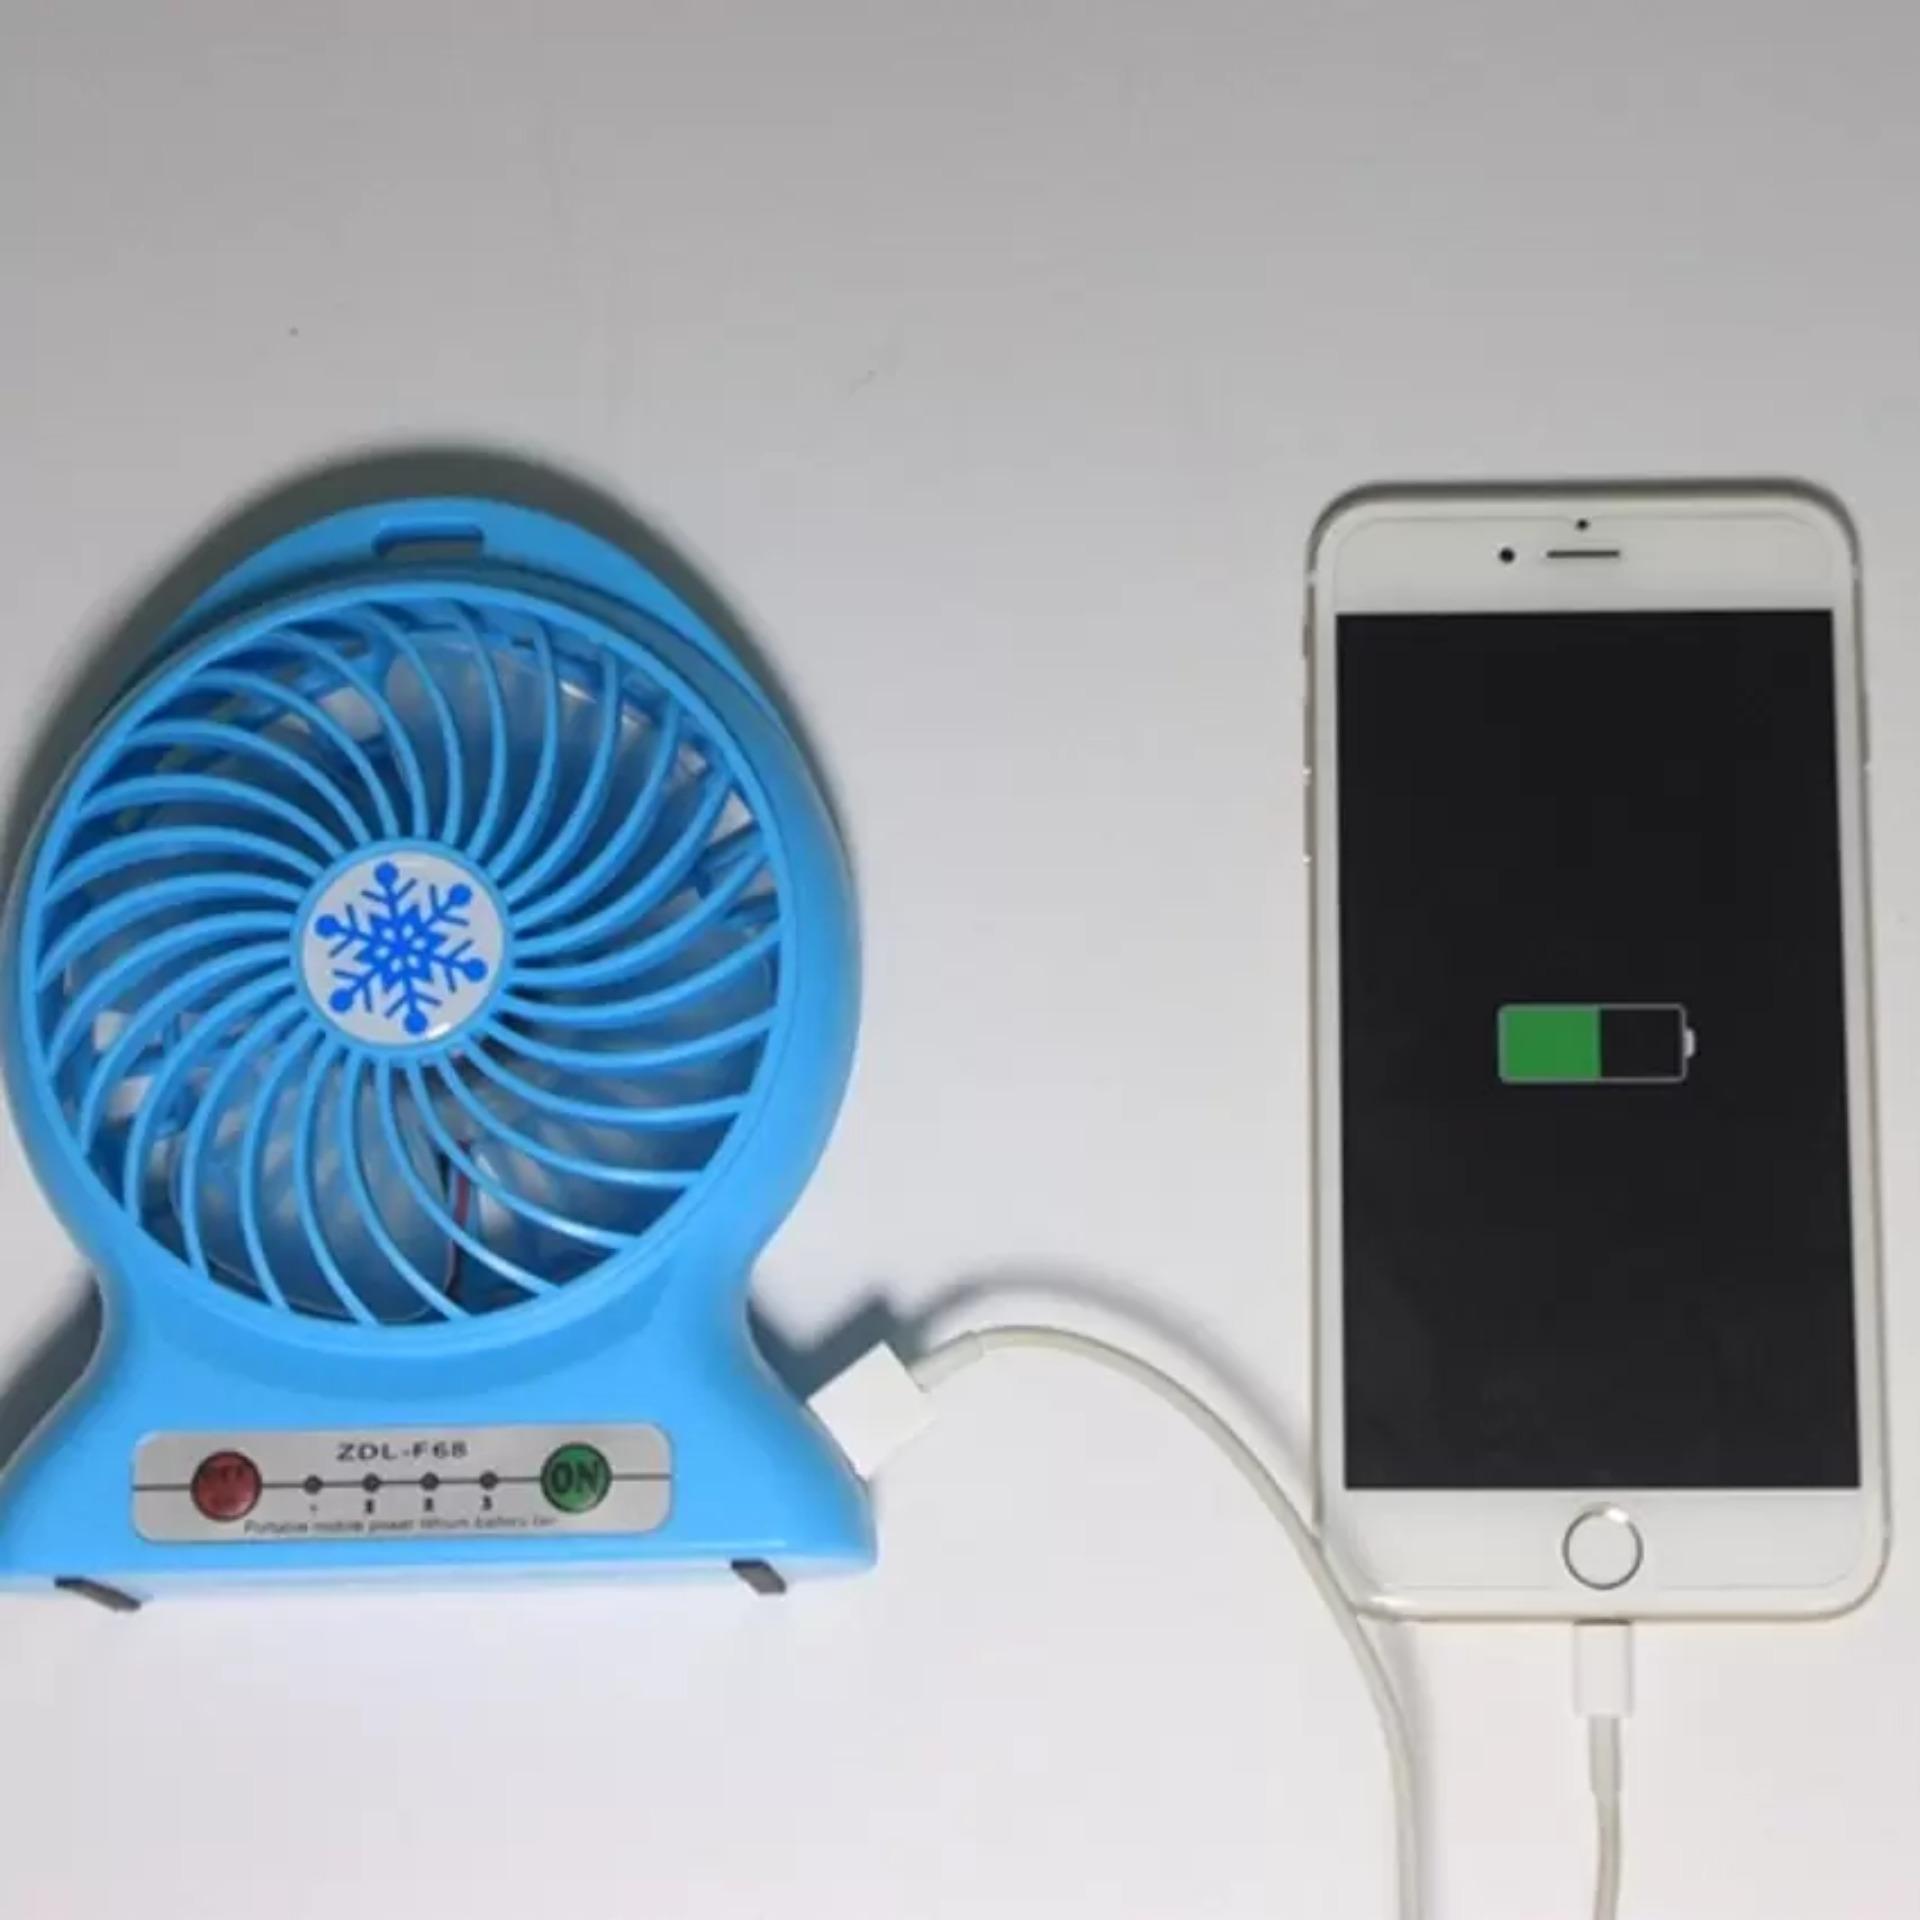 Portable Mini Fan Rechargeable: Kipas Angin Pendingin Recharge Cas Kecil ( Biru)